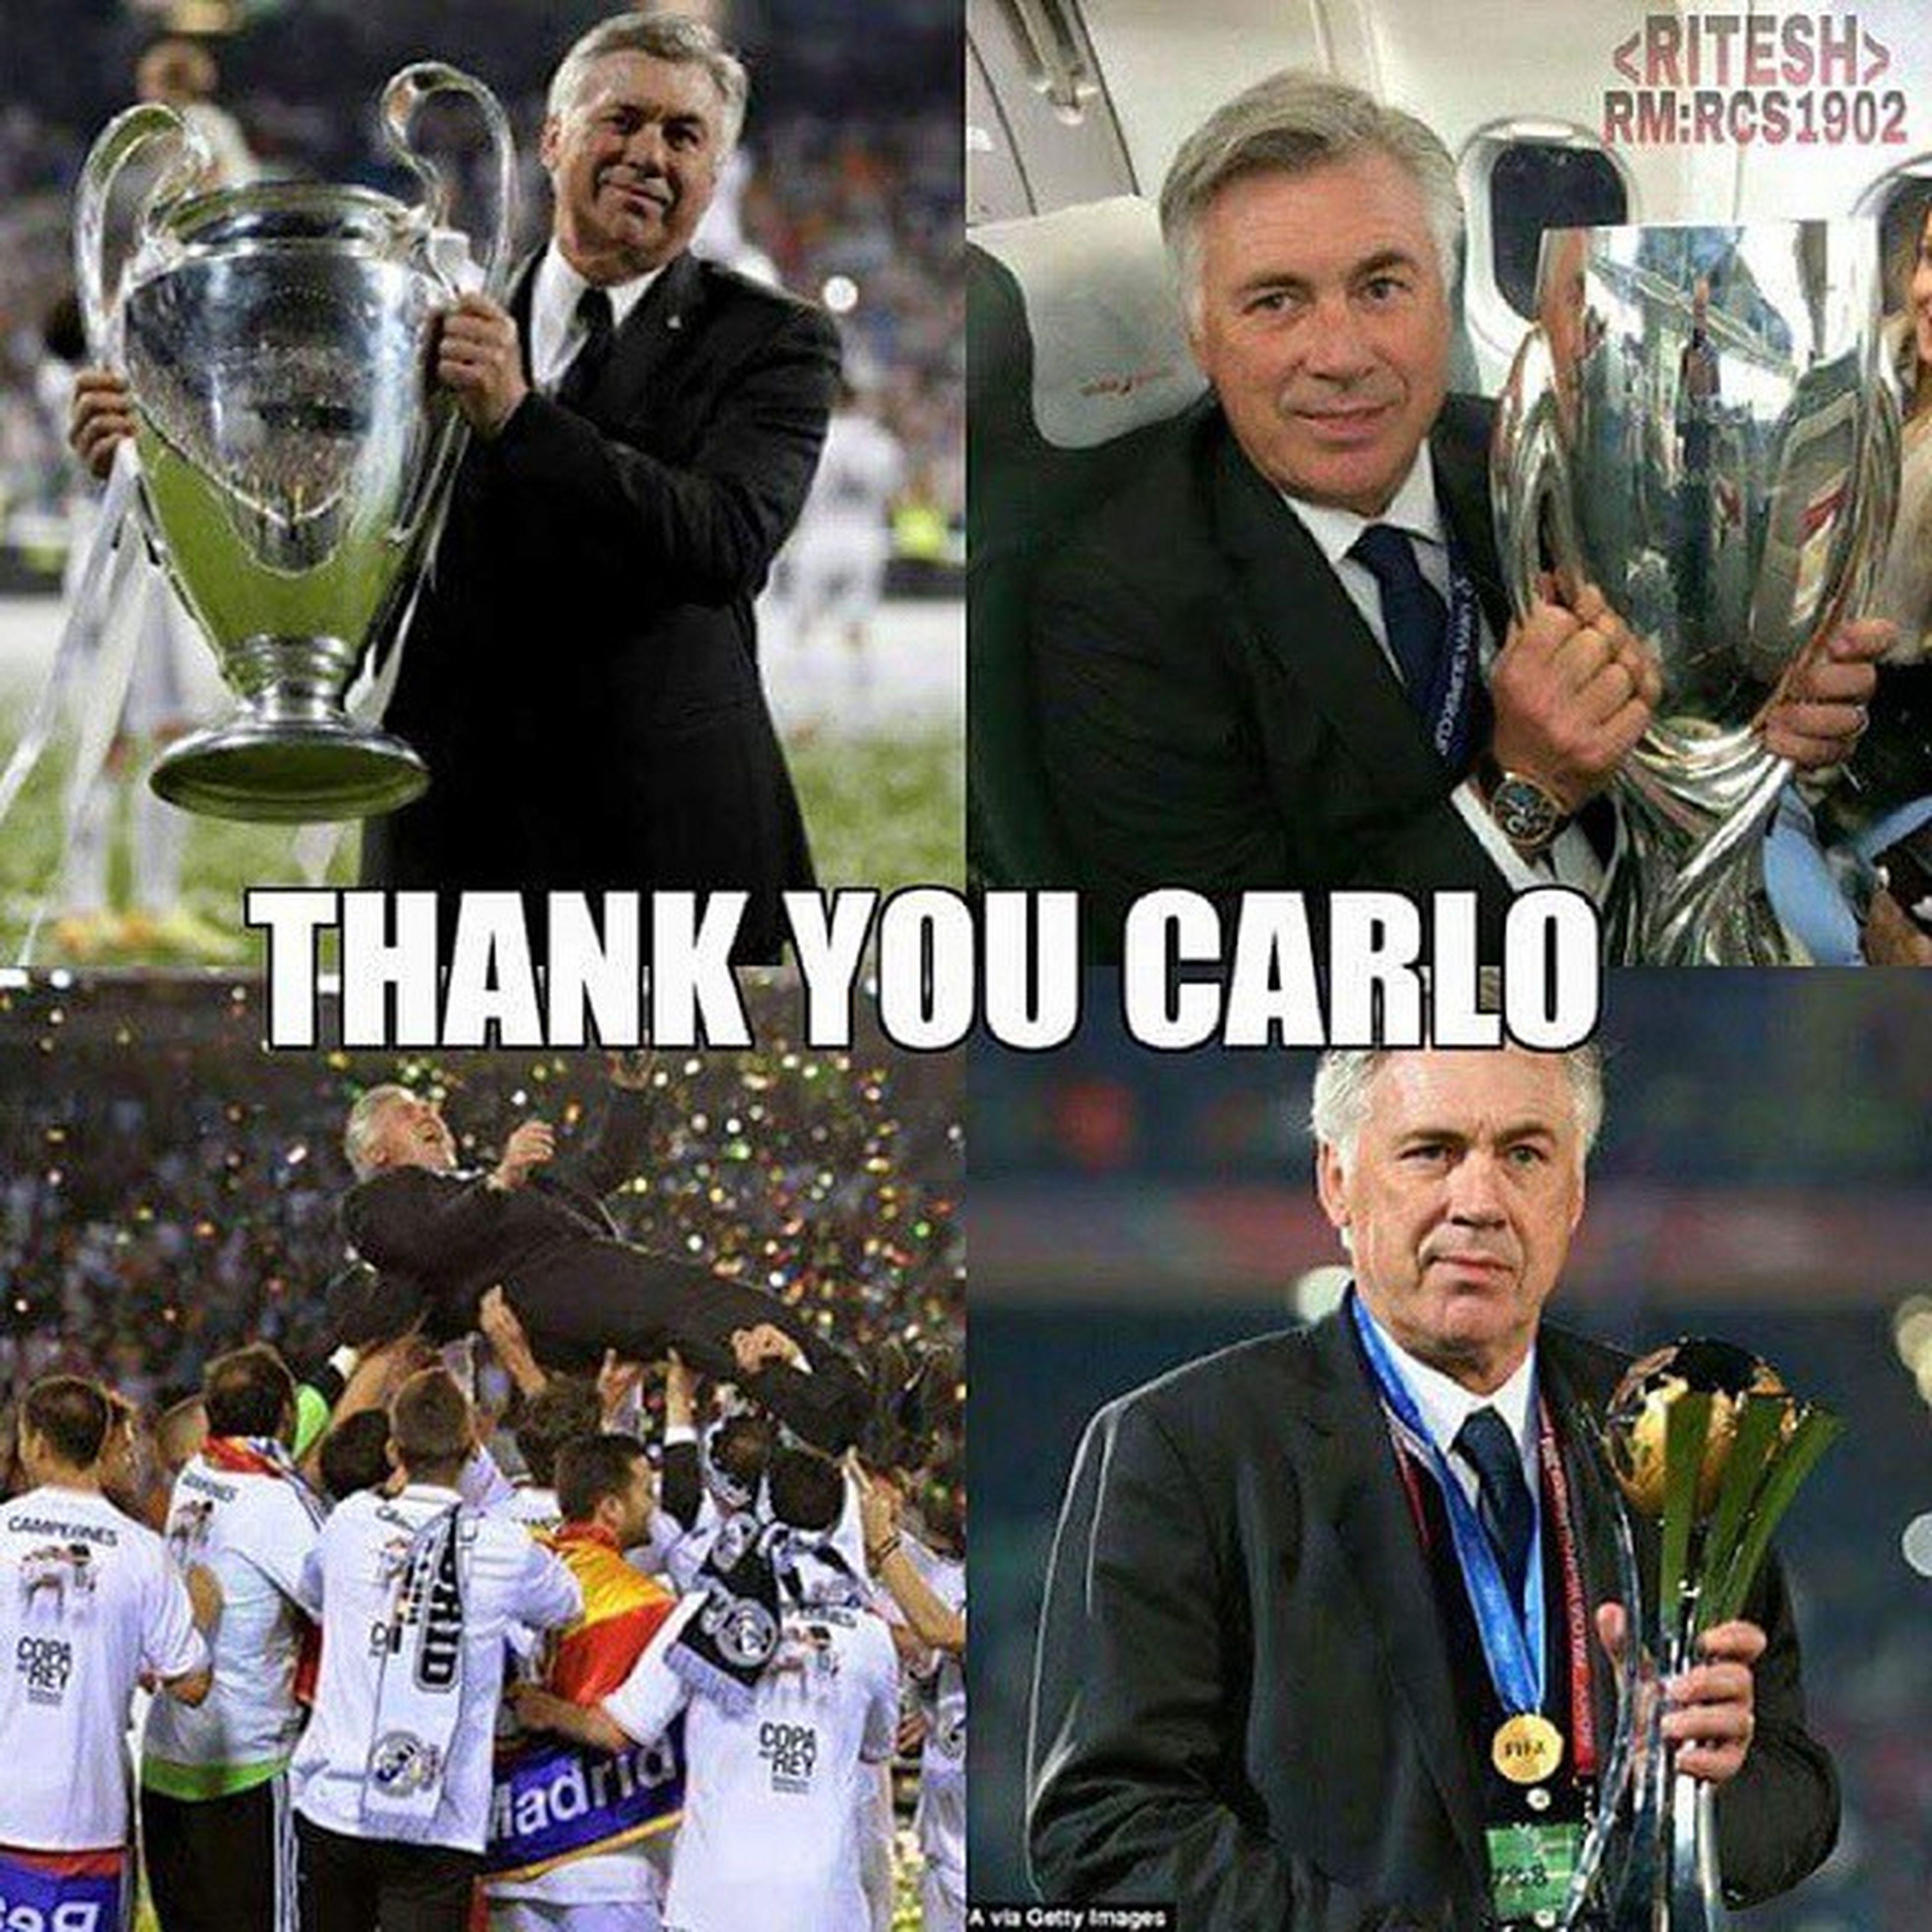 ThanksCarlo Thankyoucarlo Ancelotti Carloancelotti :-(:-(❤😞💔:-( :-( realmadrid HalaMadrid